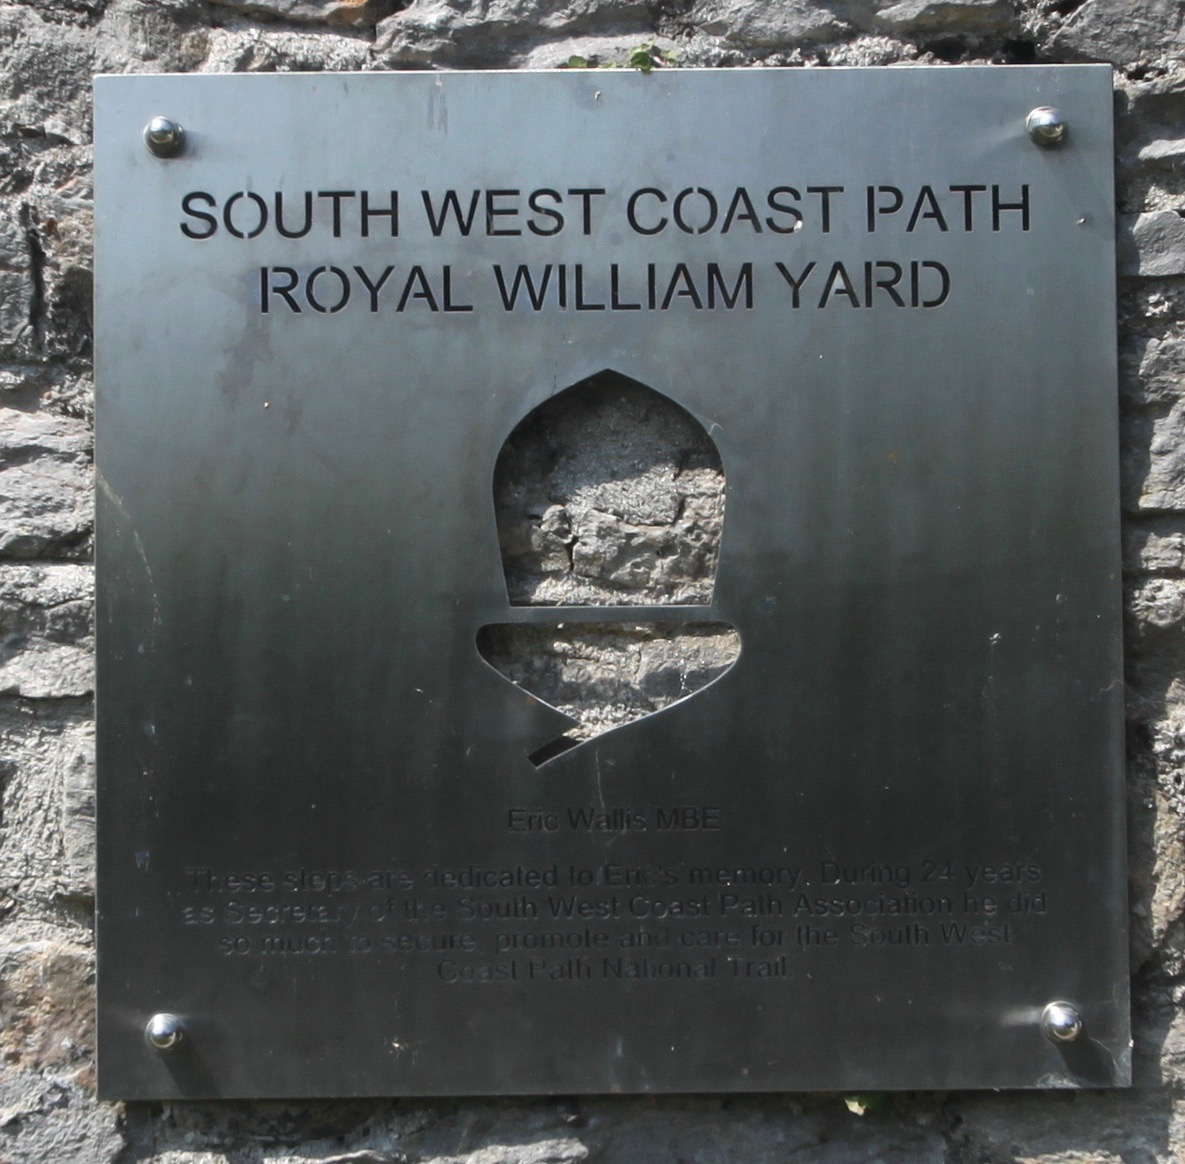 memorial to eric wallis